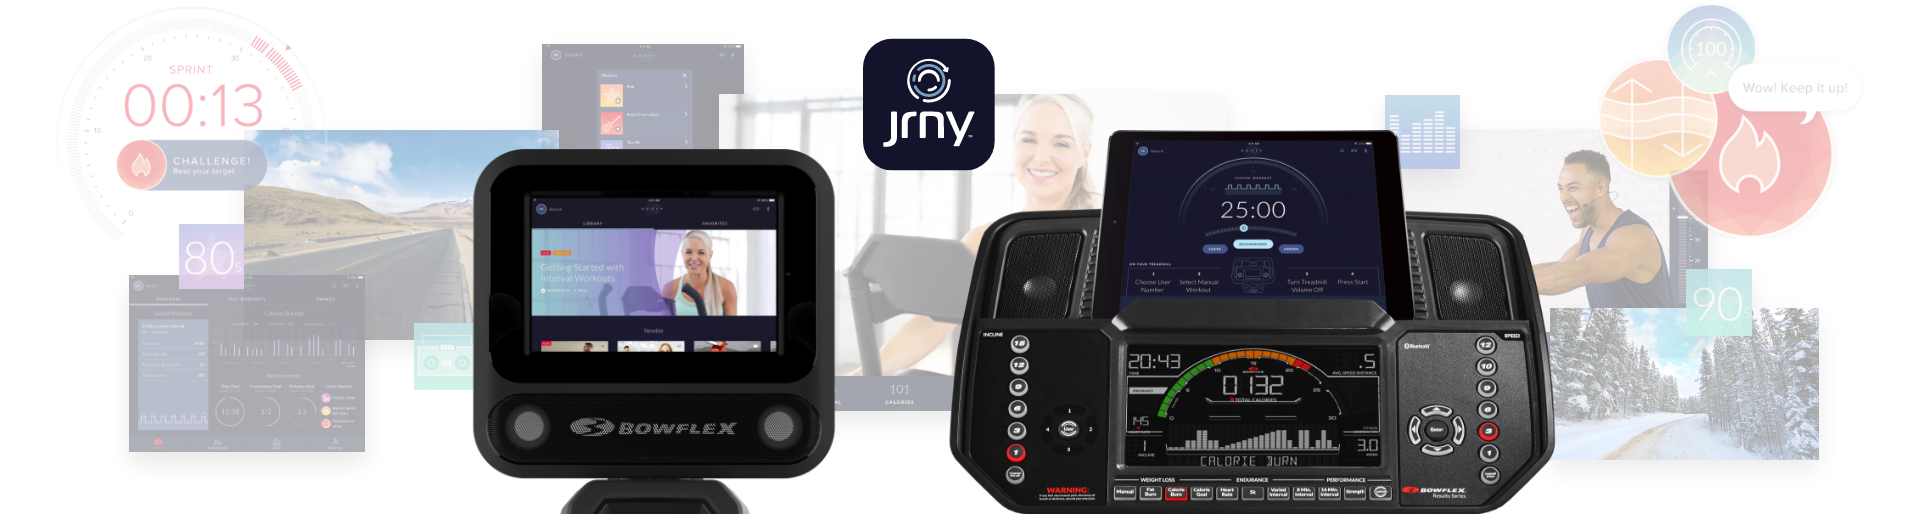 JRNY App - digital assets and screenshots